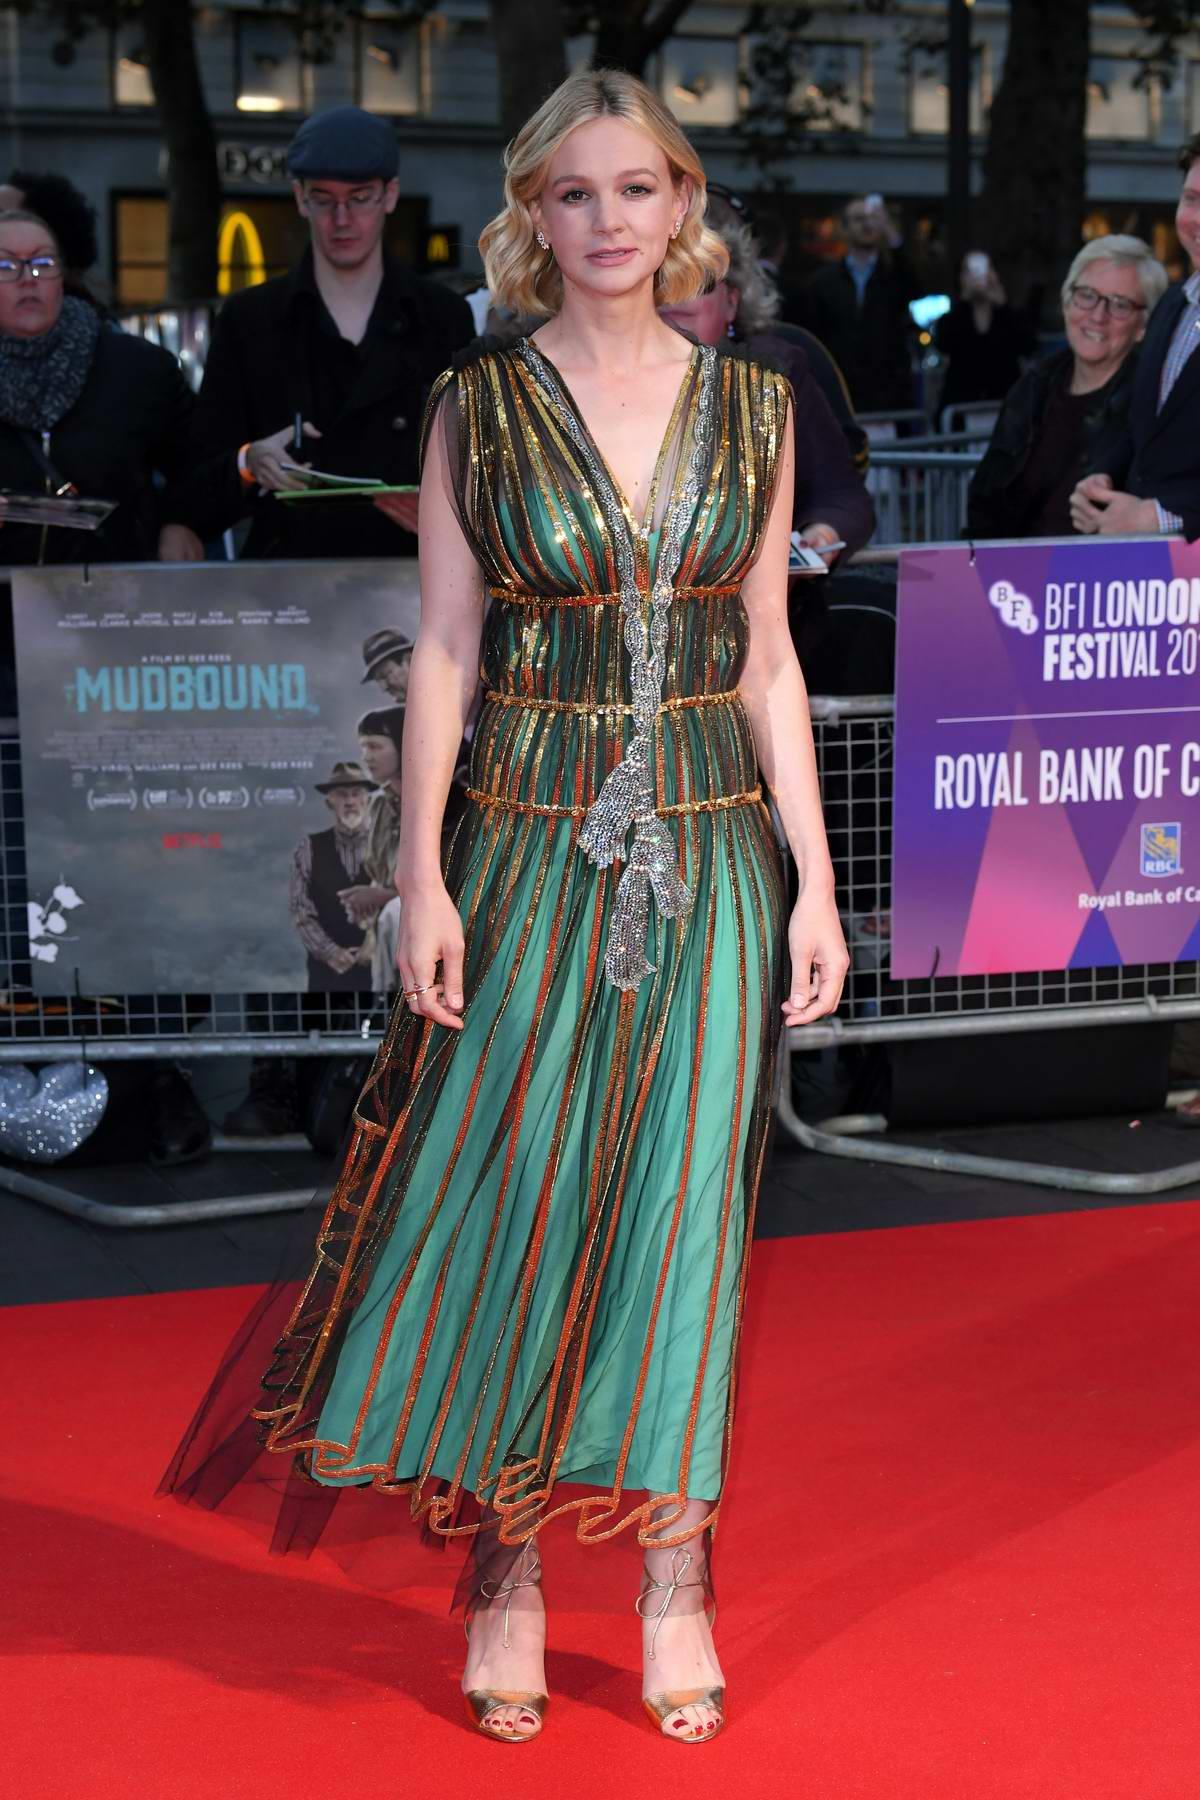 Carey Mulligan attends Mudbound film premiere during BFI London Film Festival in London